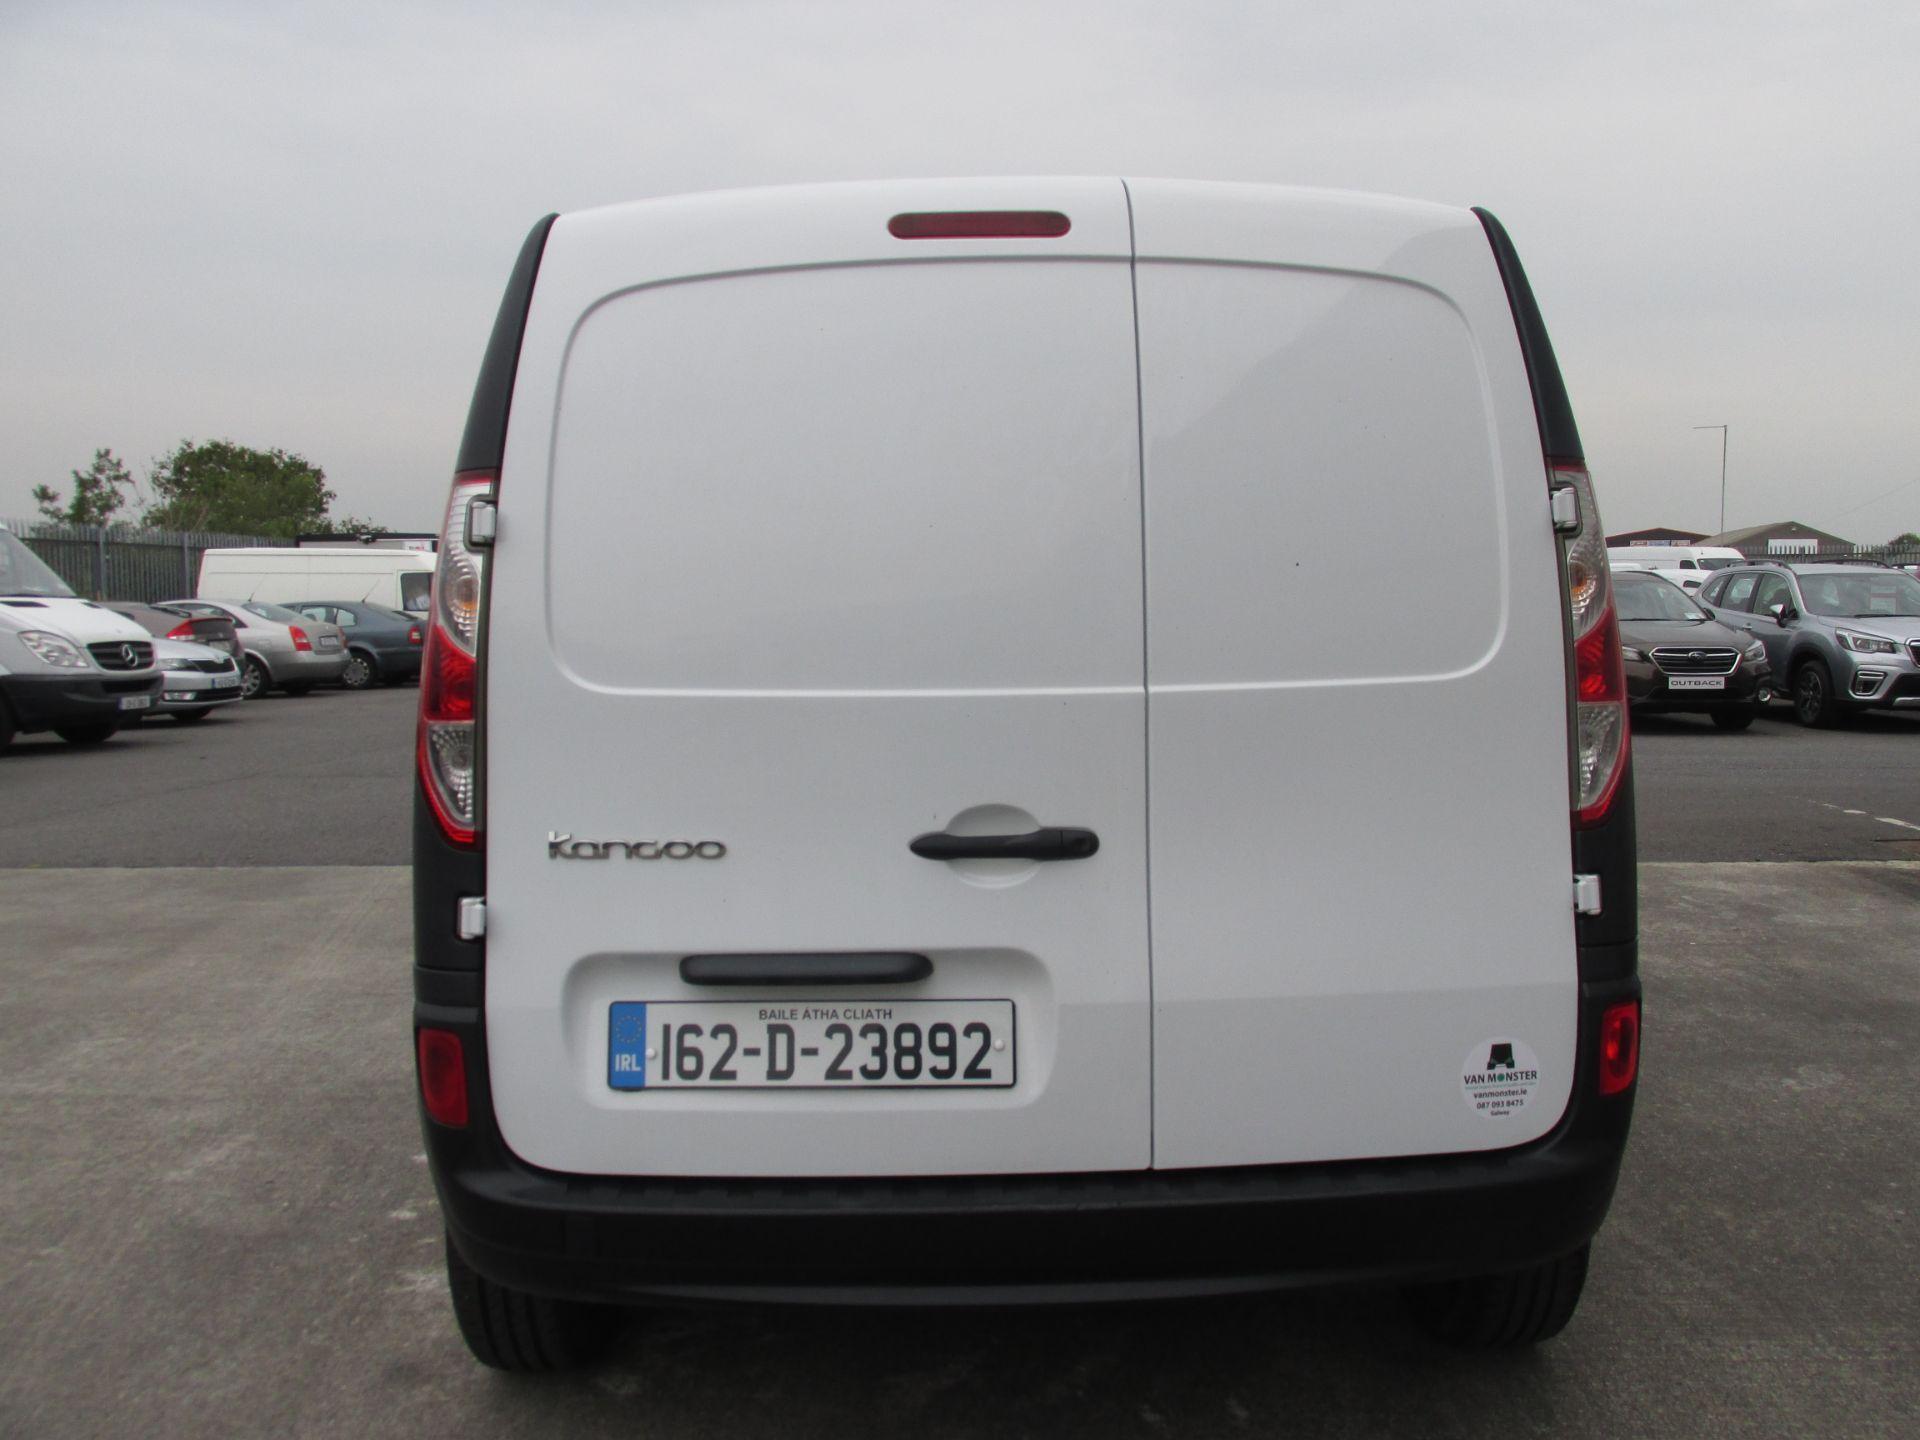 2016 Renault Kangoo ML19 Energy DCI 75 Business 2D (162D23892) Image 5